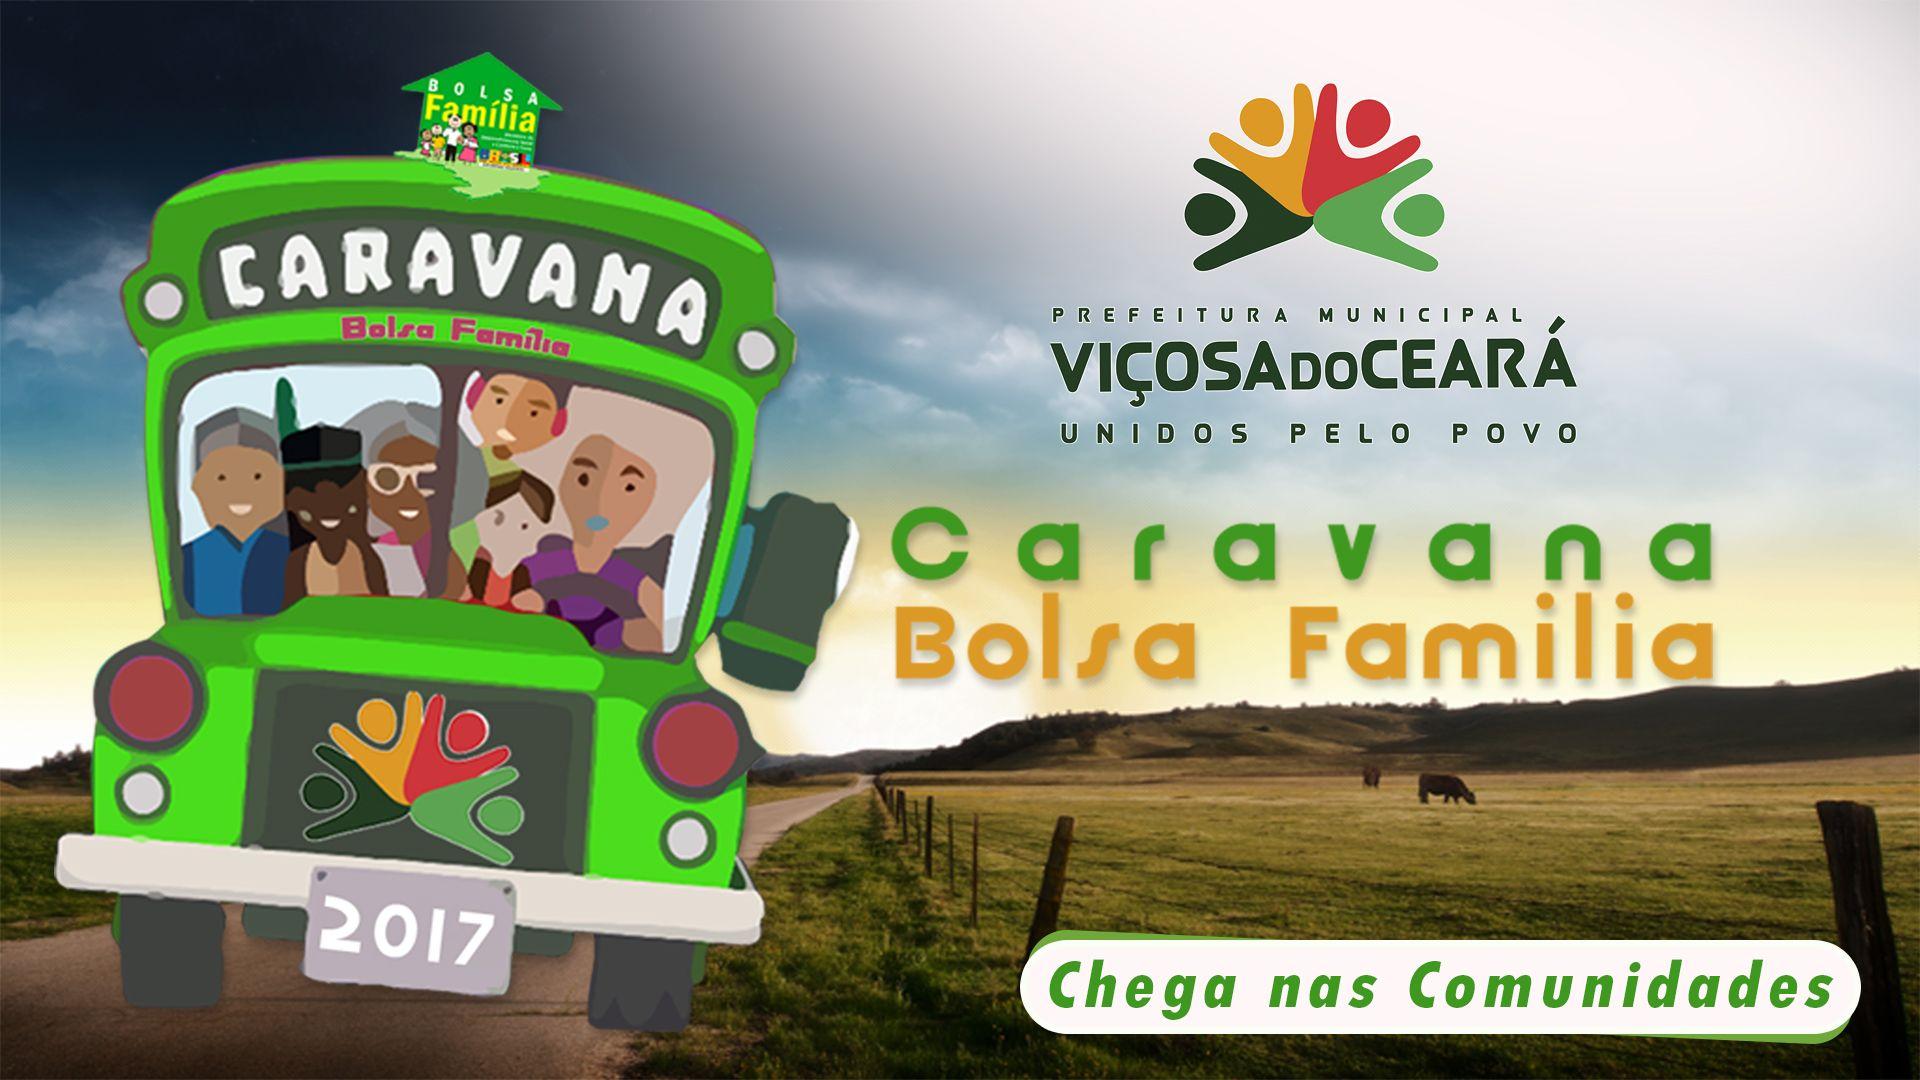 CARAVANA DO BOLSA FAMÍLIA CHEGA NAS COMUNIDADES